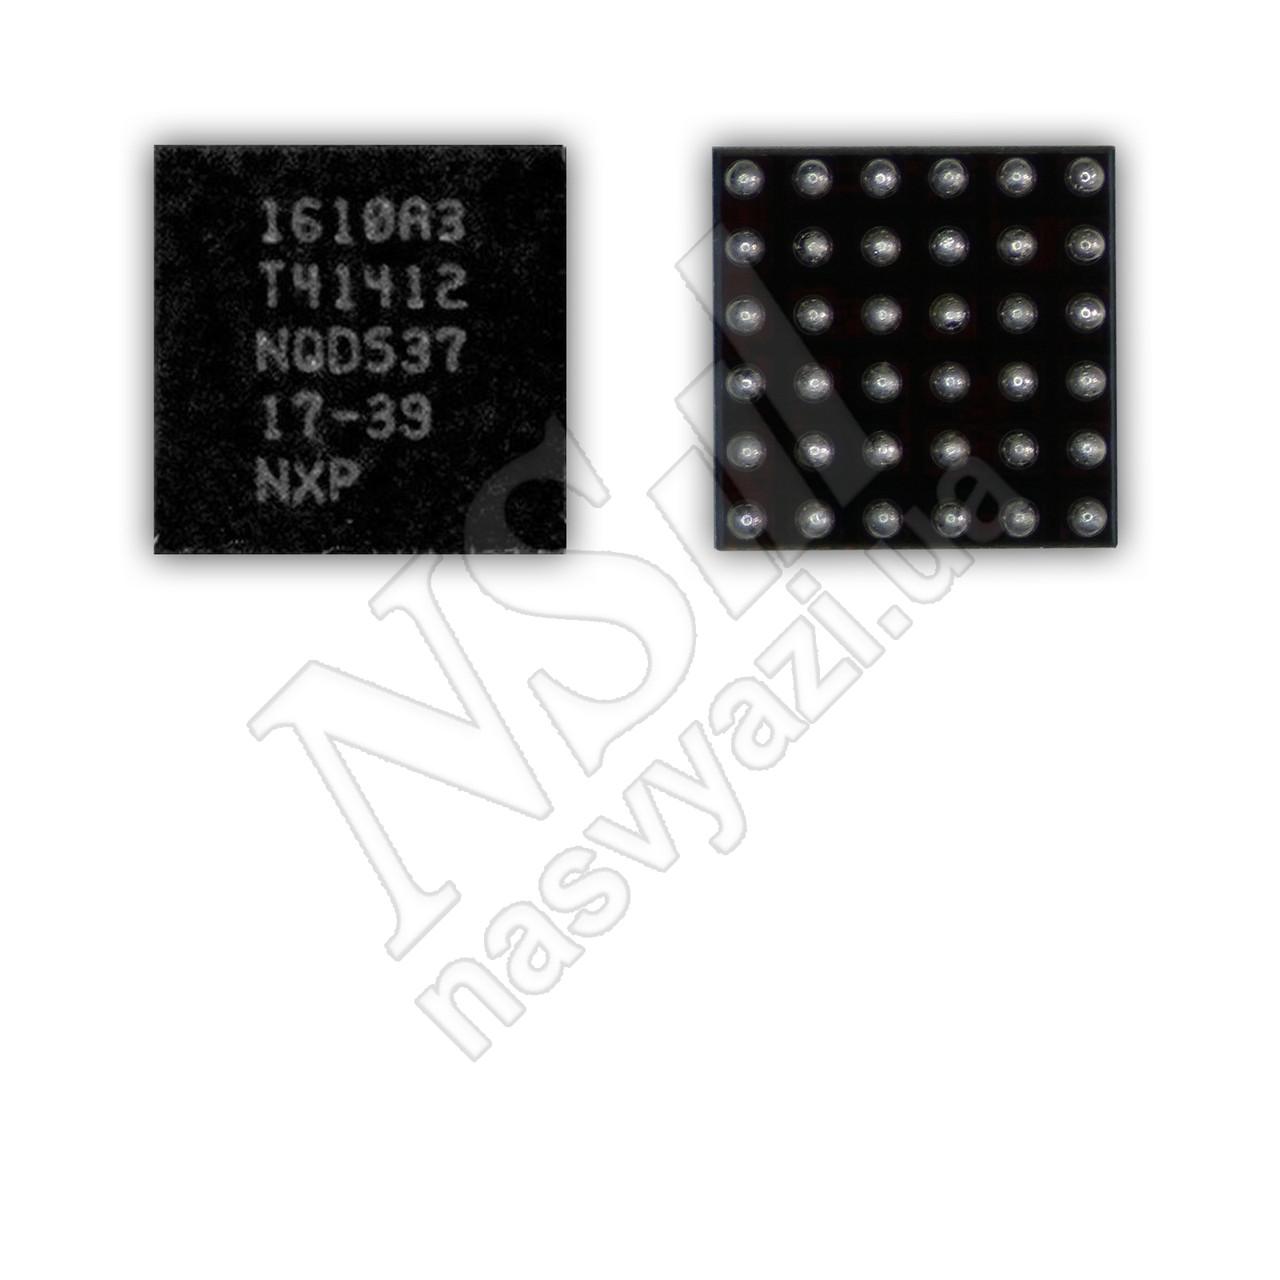 iphone 6s замена 1610a3